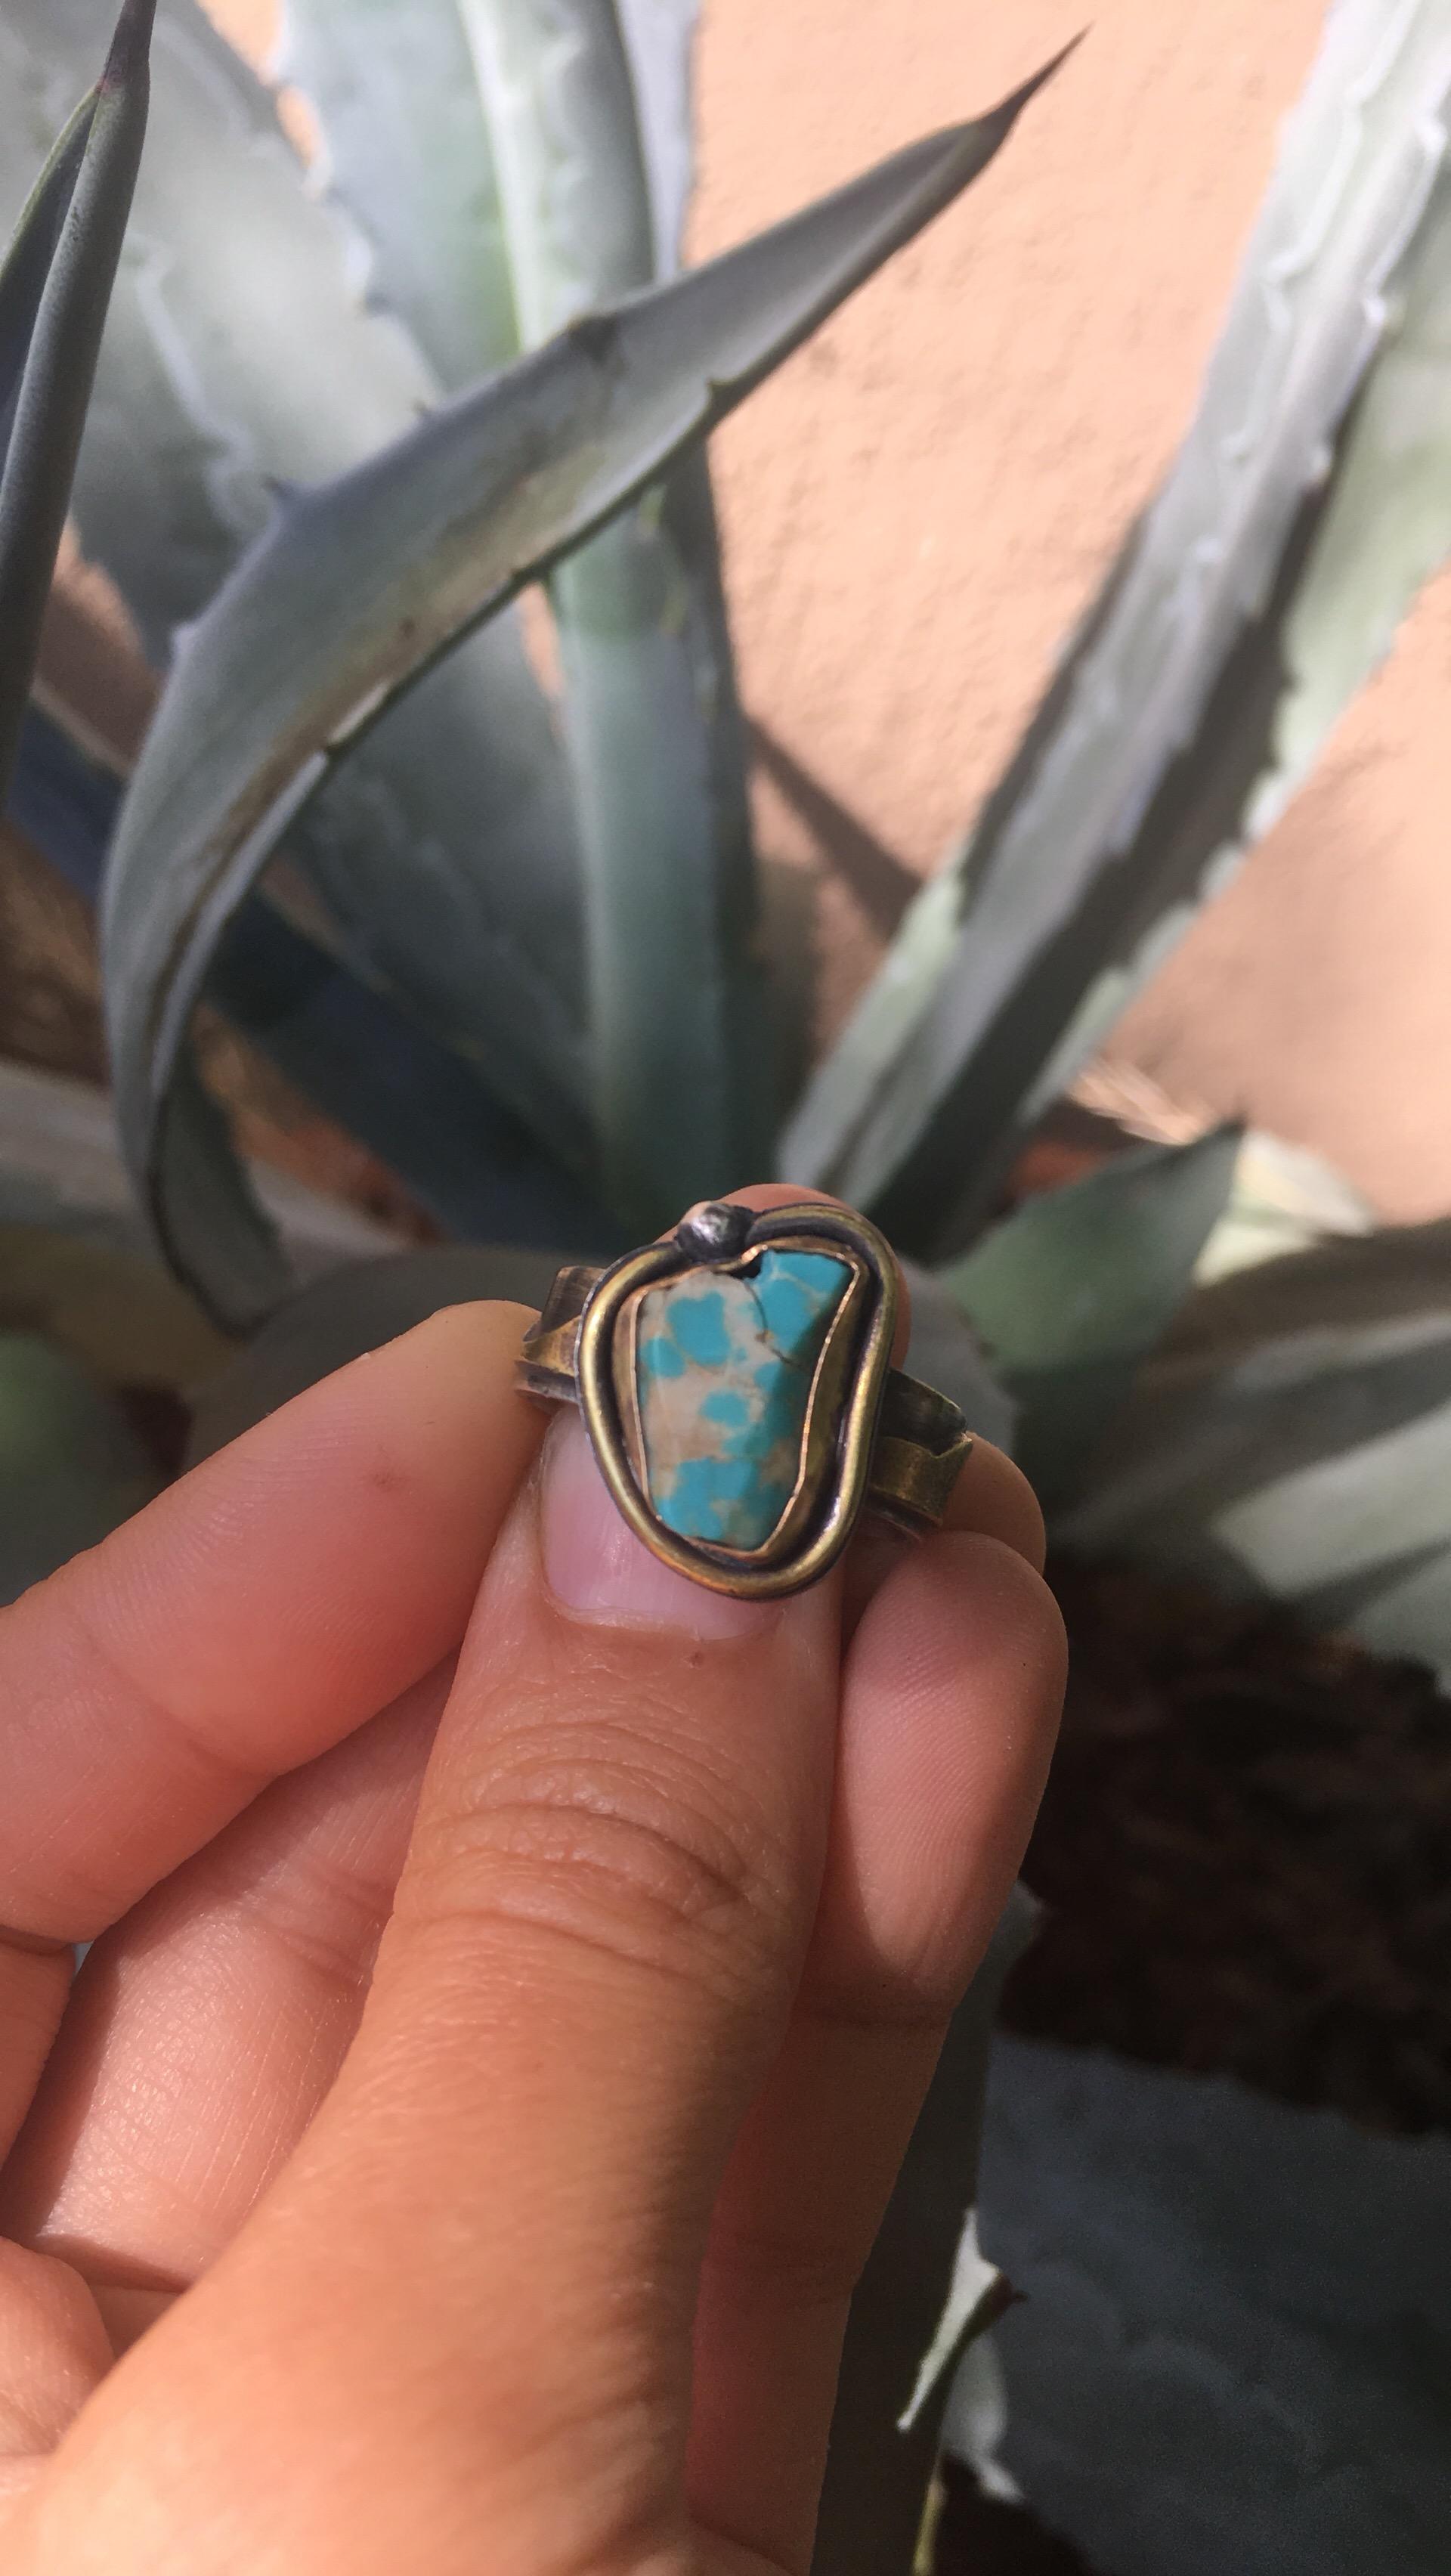 Custom Turquoise Ring with Mountain Range Band